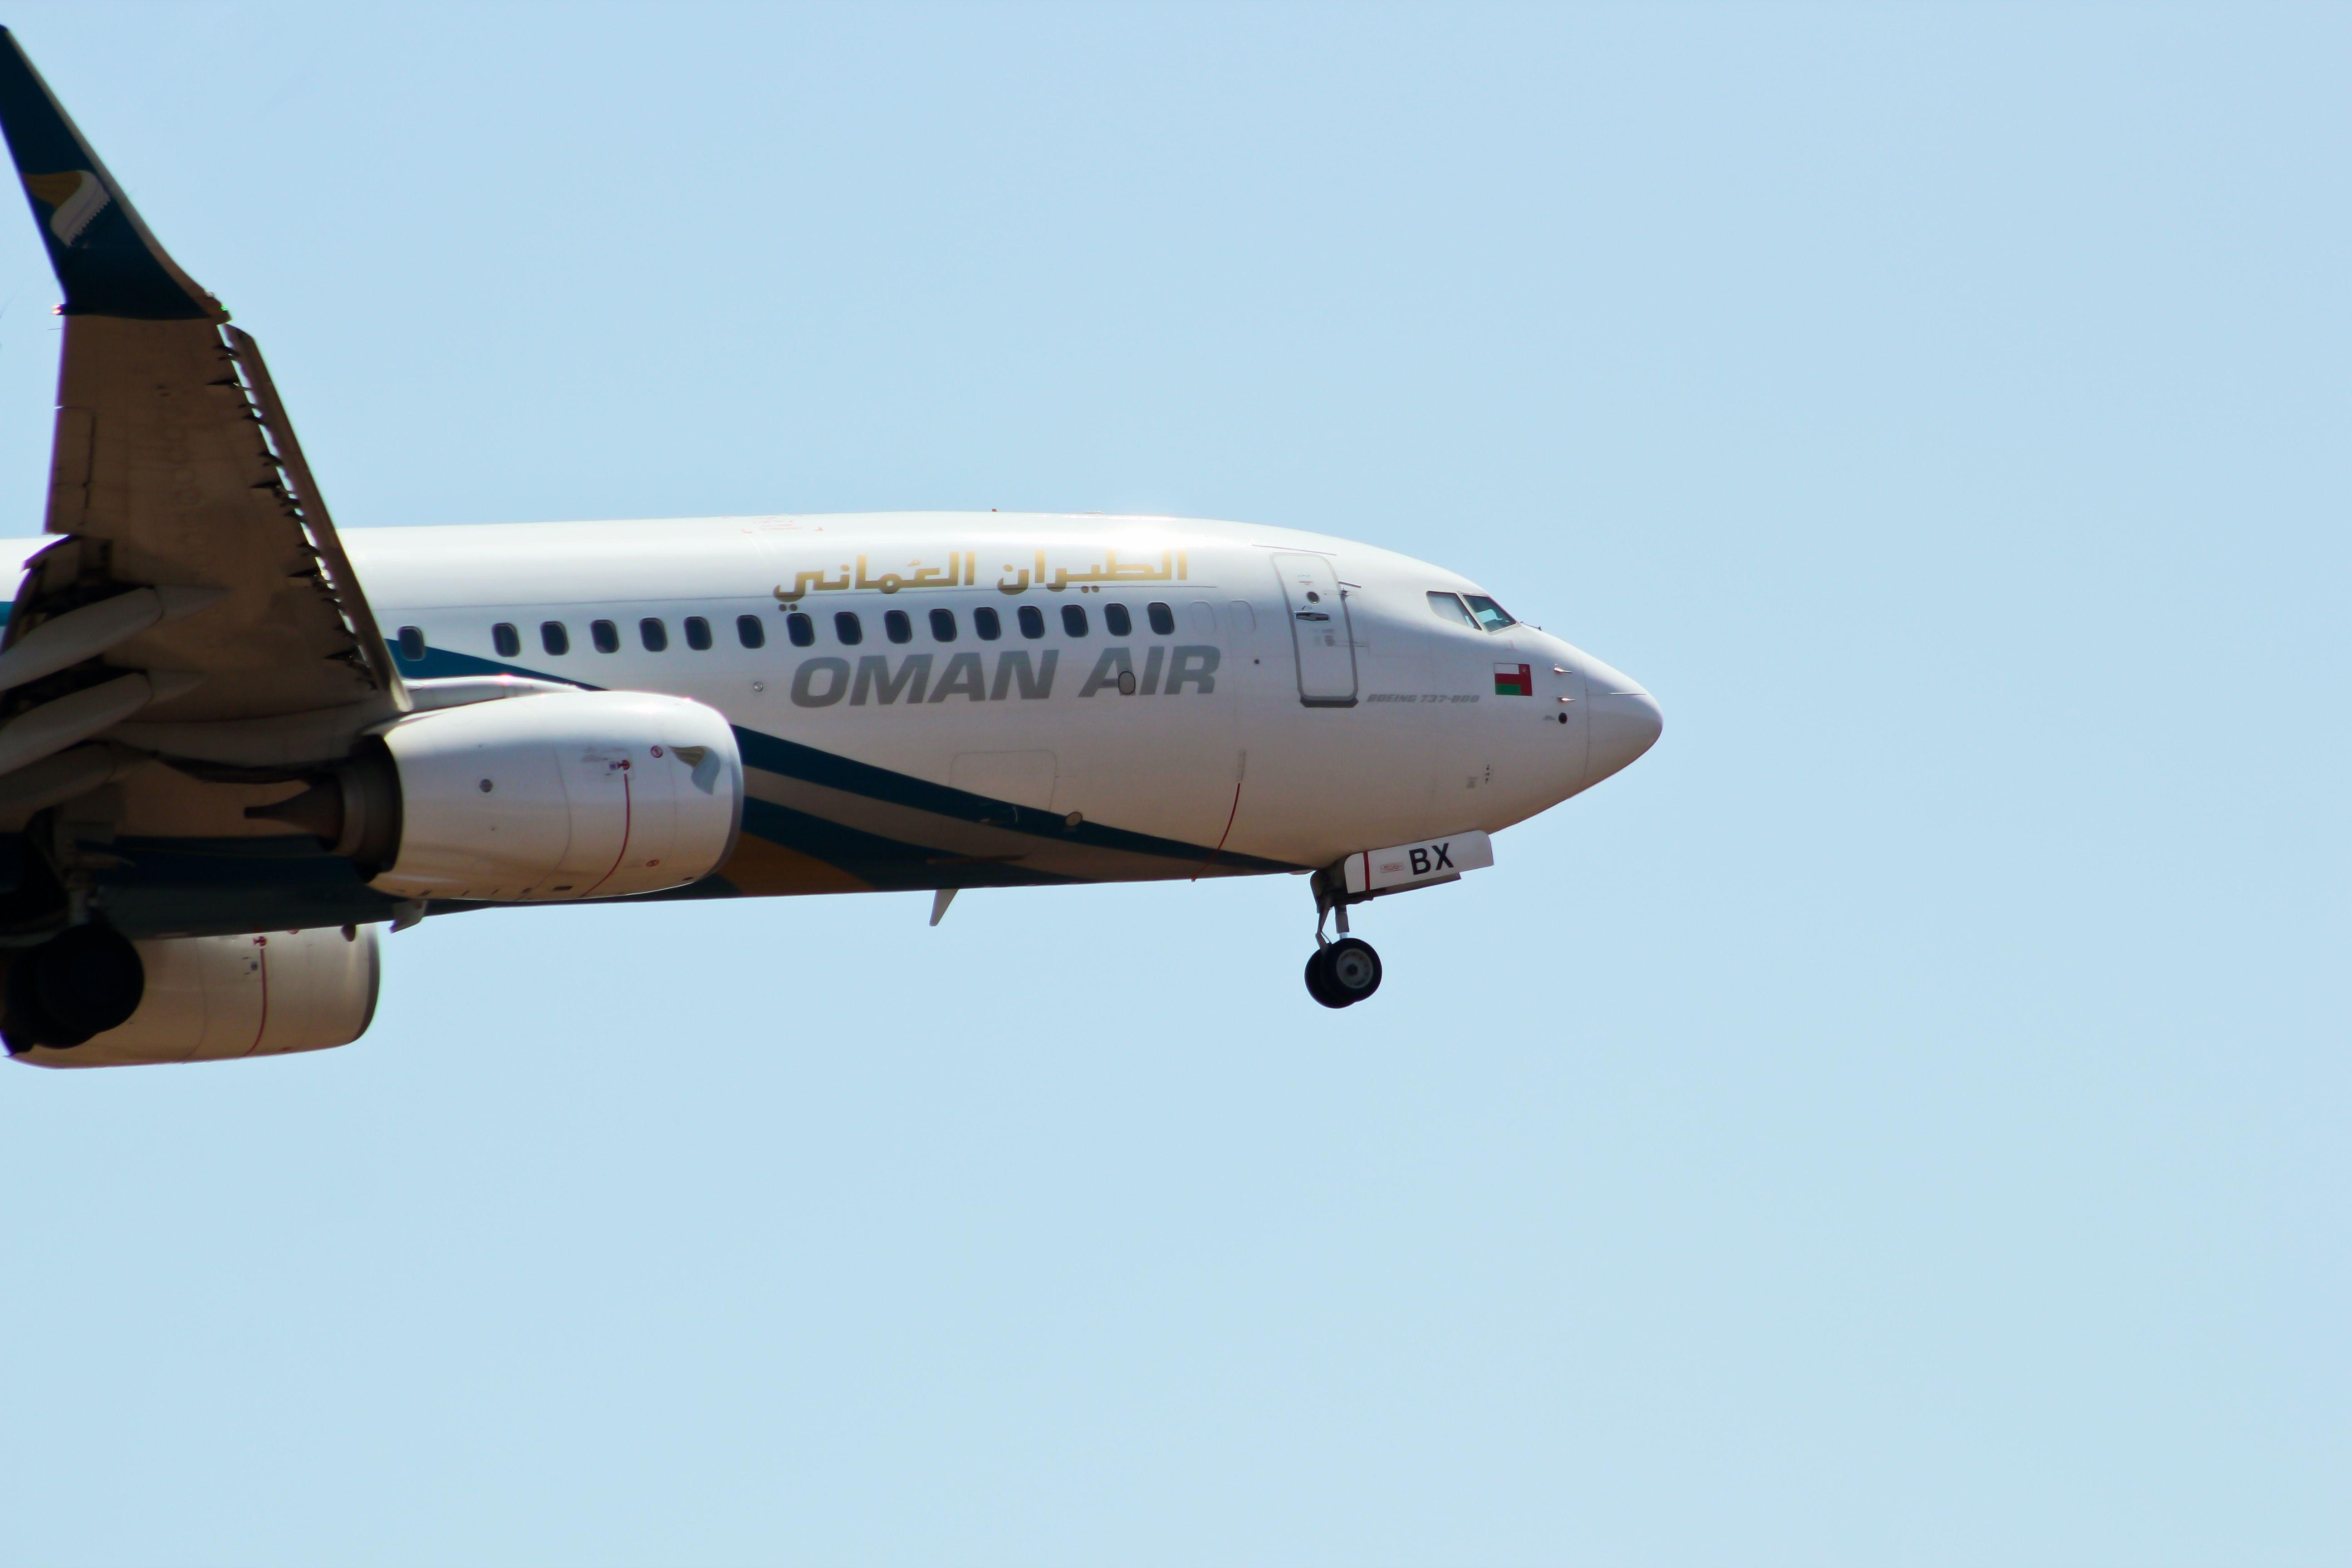 Oman Air Boeing 737800 Boeing 737, Boeing, Passenger jet